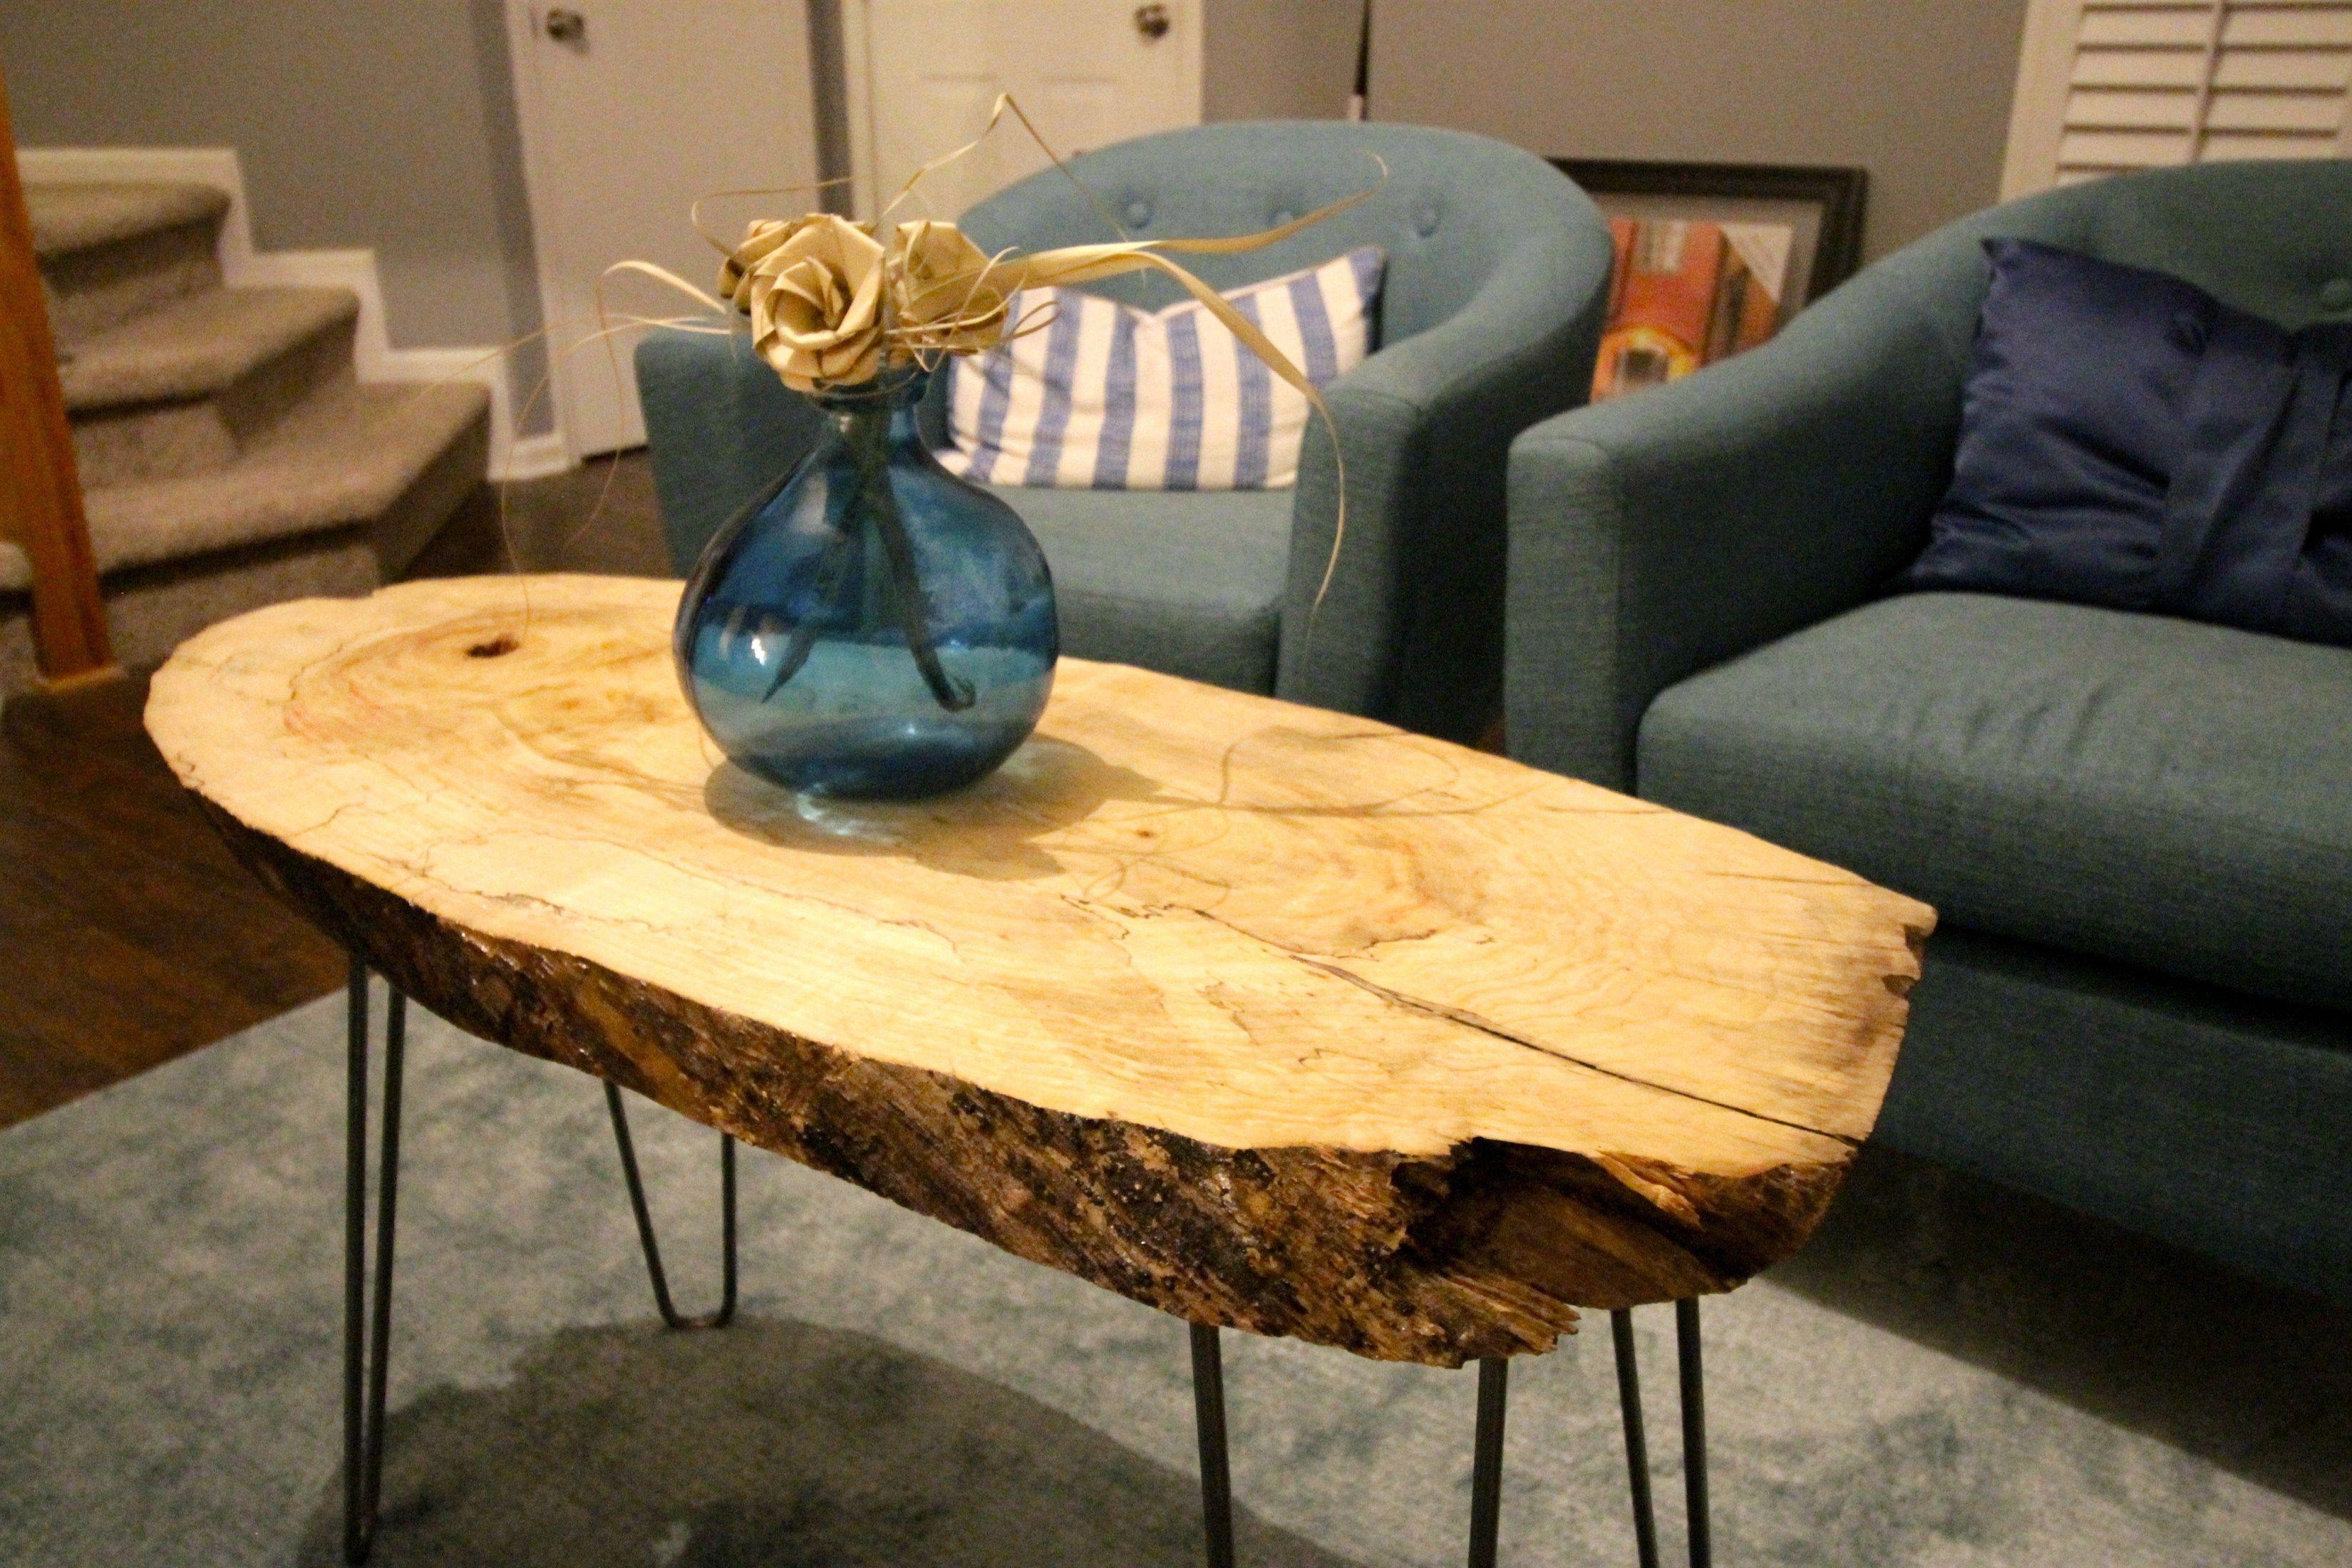 Diy Live Edge Wood Slab Coffee Table Wood Slab Table Live Edge Coffee Table Live Edge Wood Table [ 2200 x 3300 Pixel ]